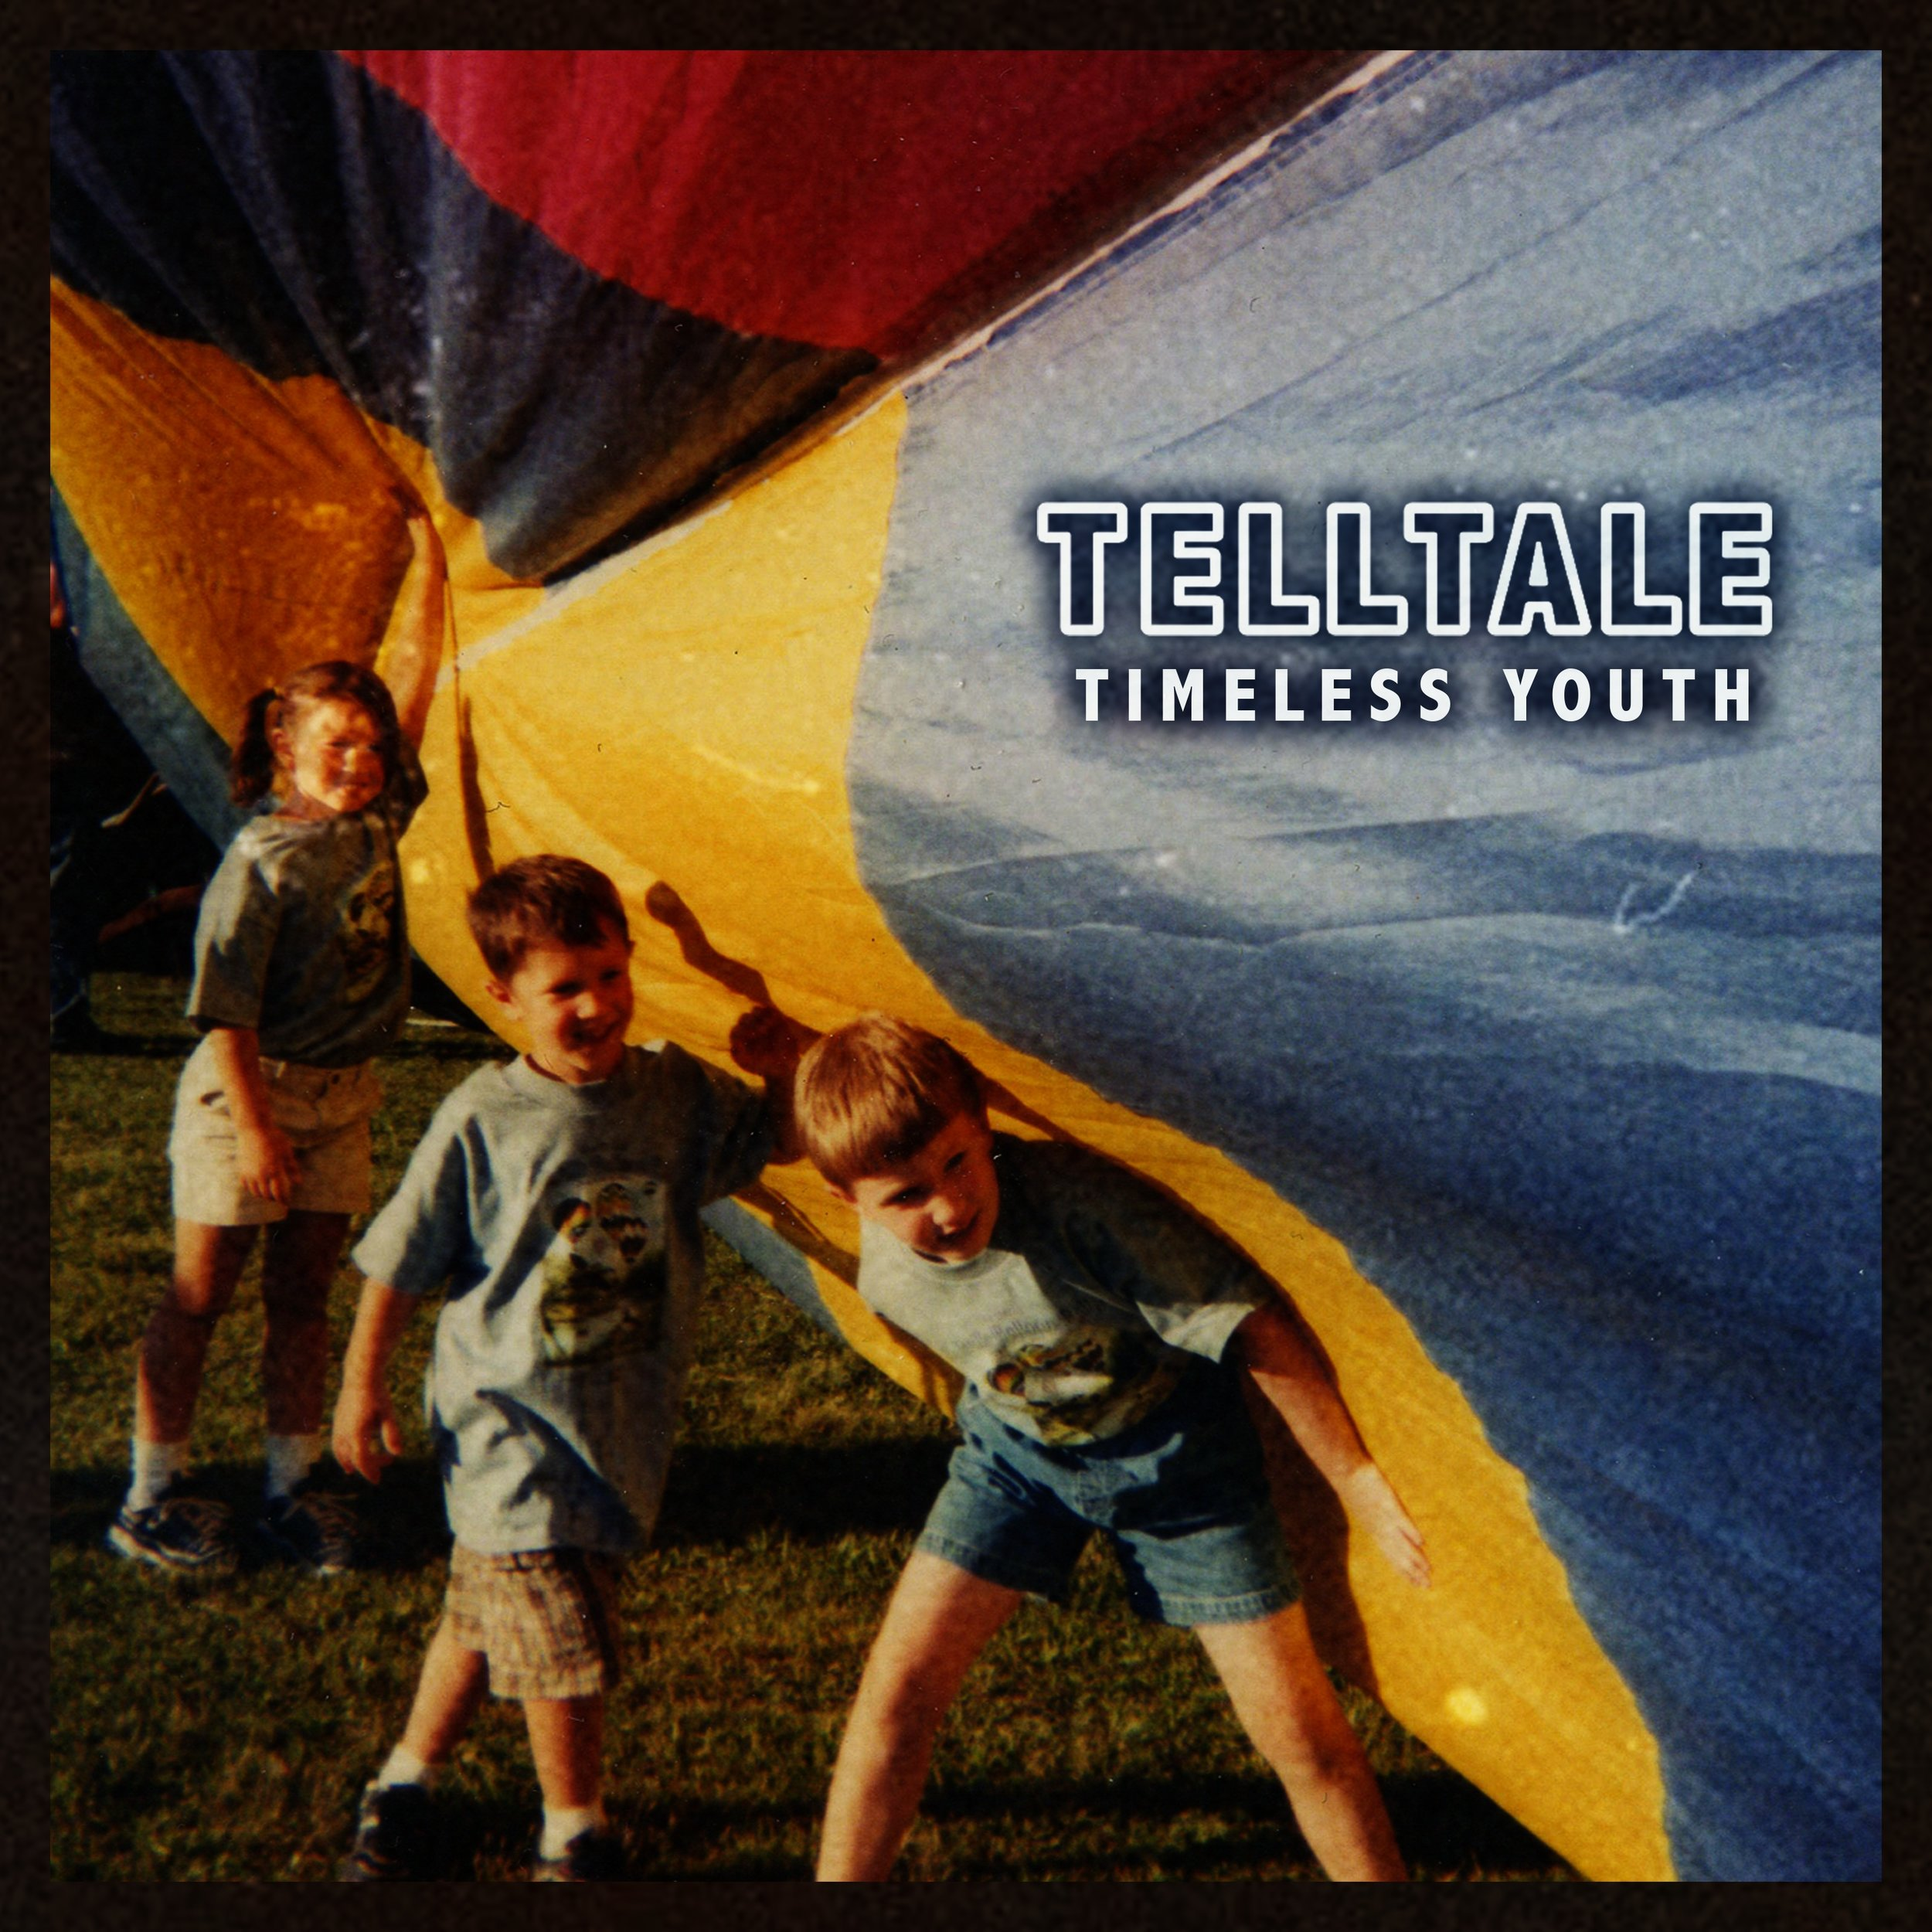 Telltale-Timeless-Youth.jpg